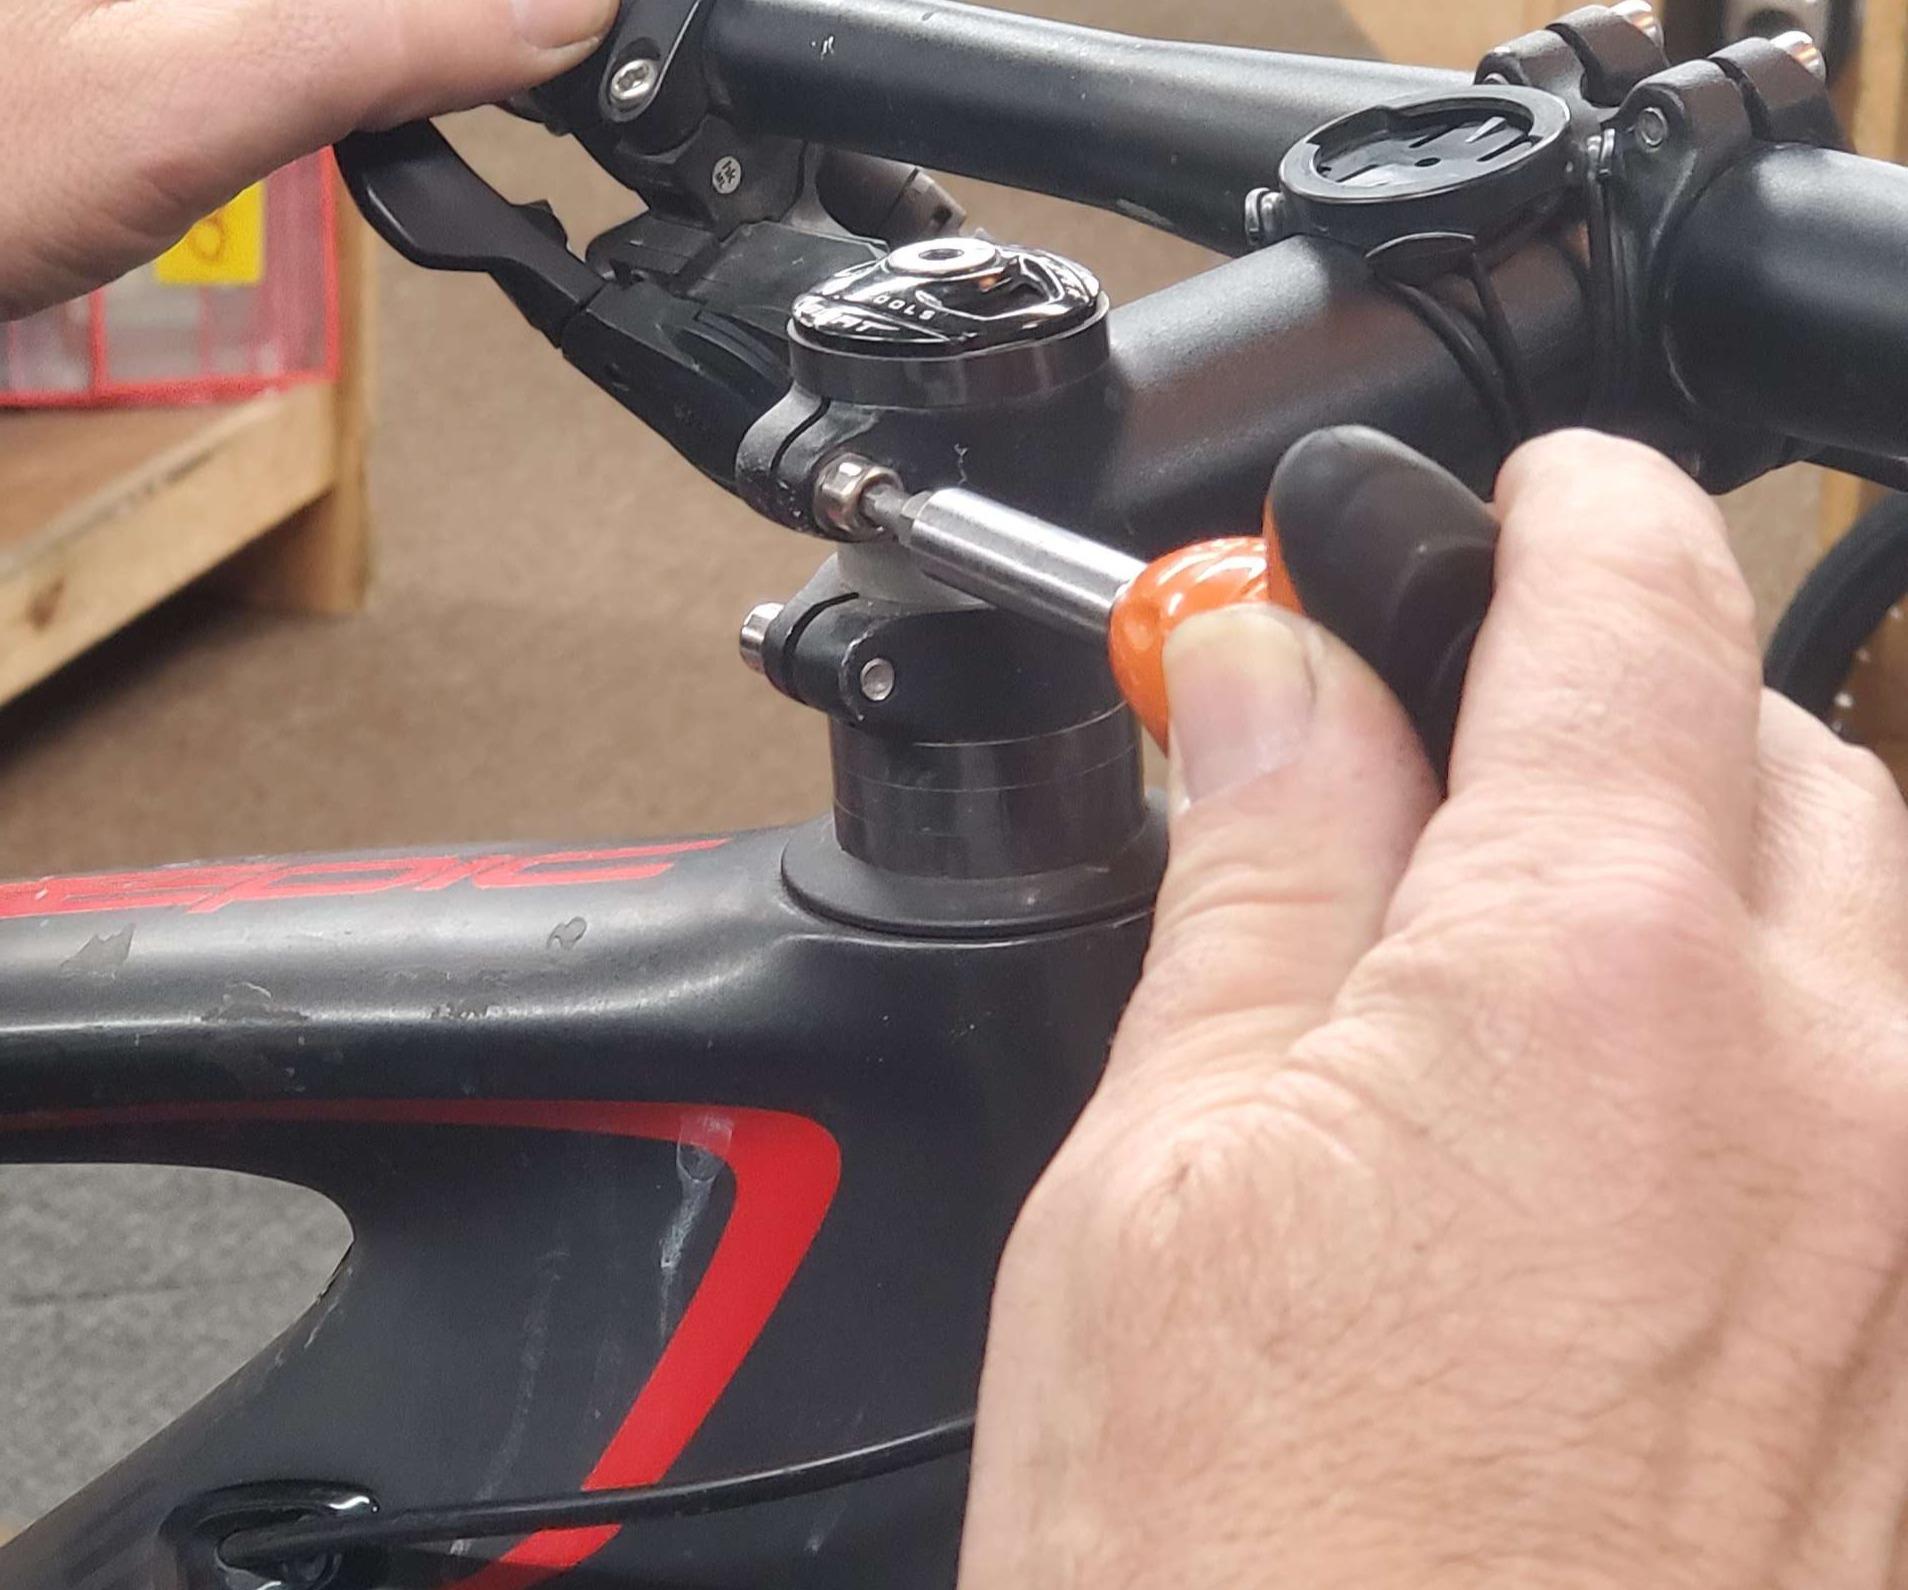 Making bike adjustments